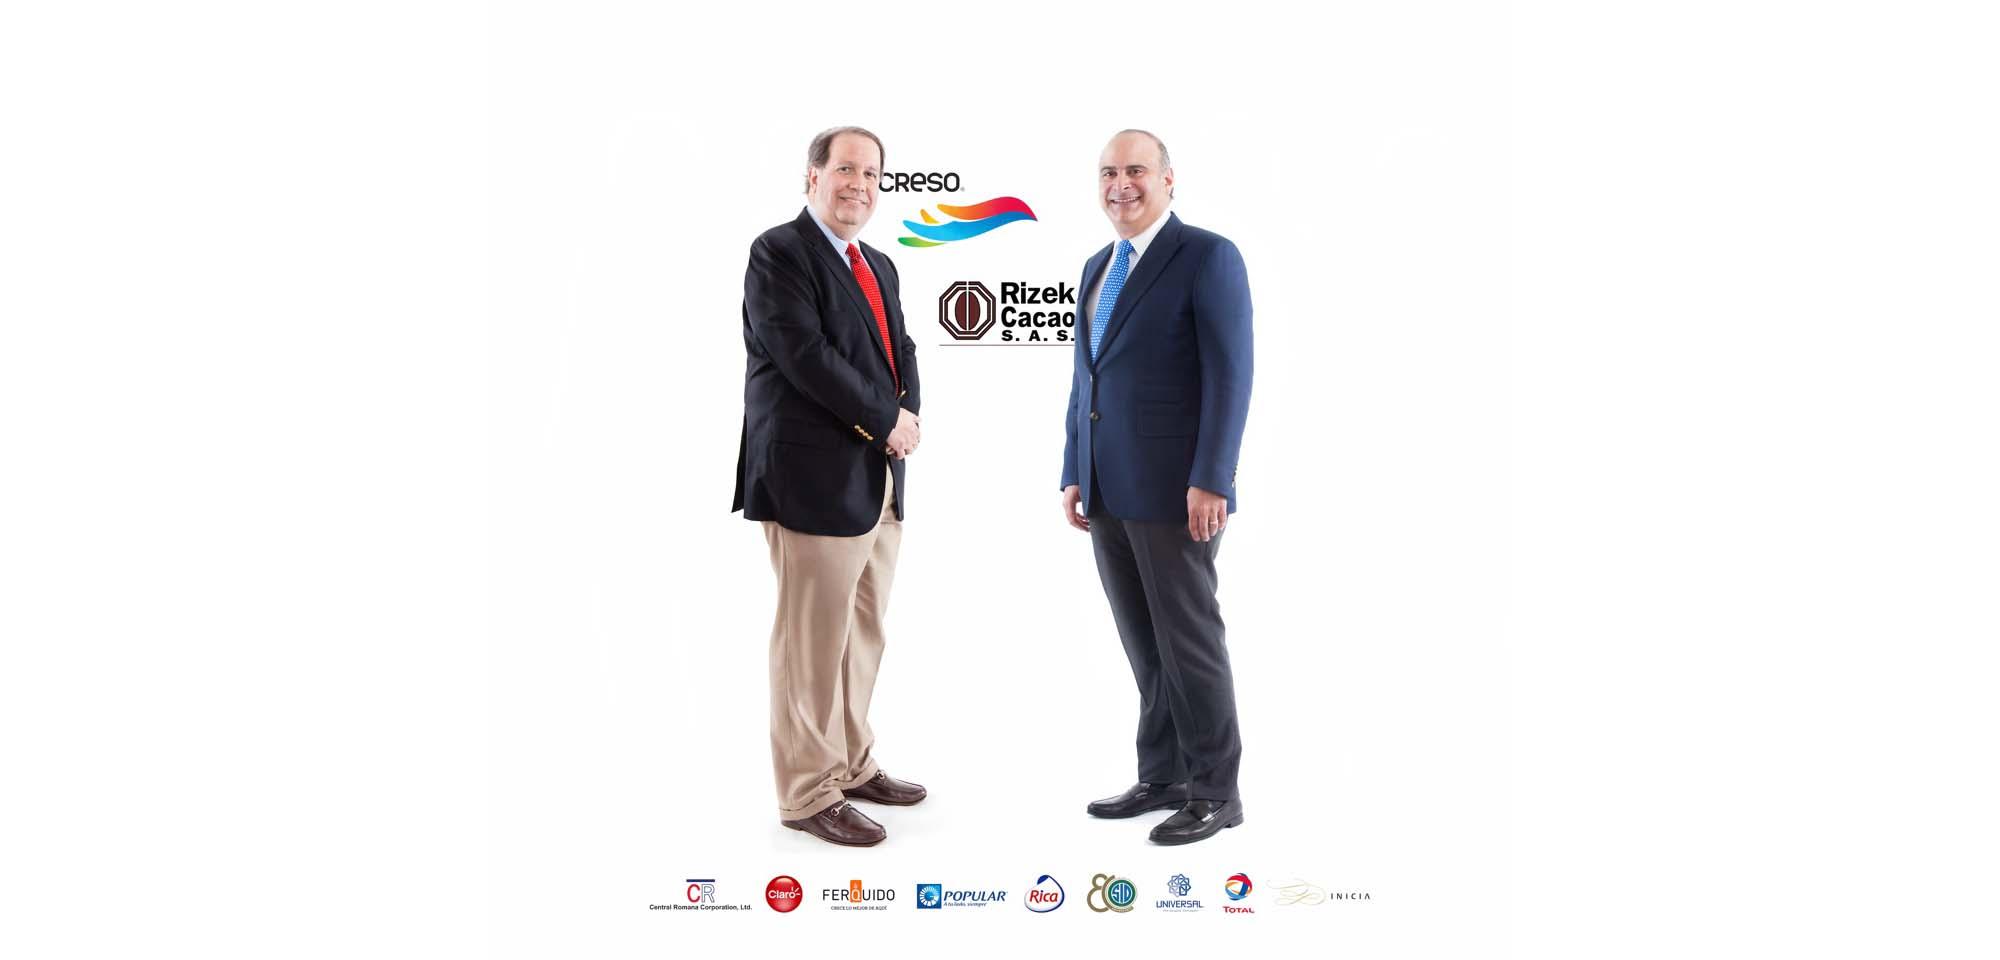 CRESO Welcomes Grupo Rizek as New Partner - Felipe Vicini